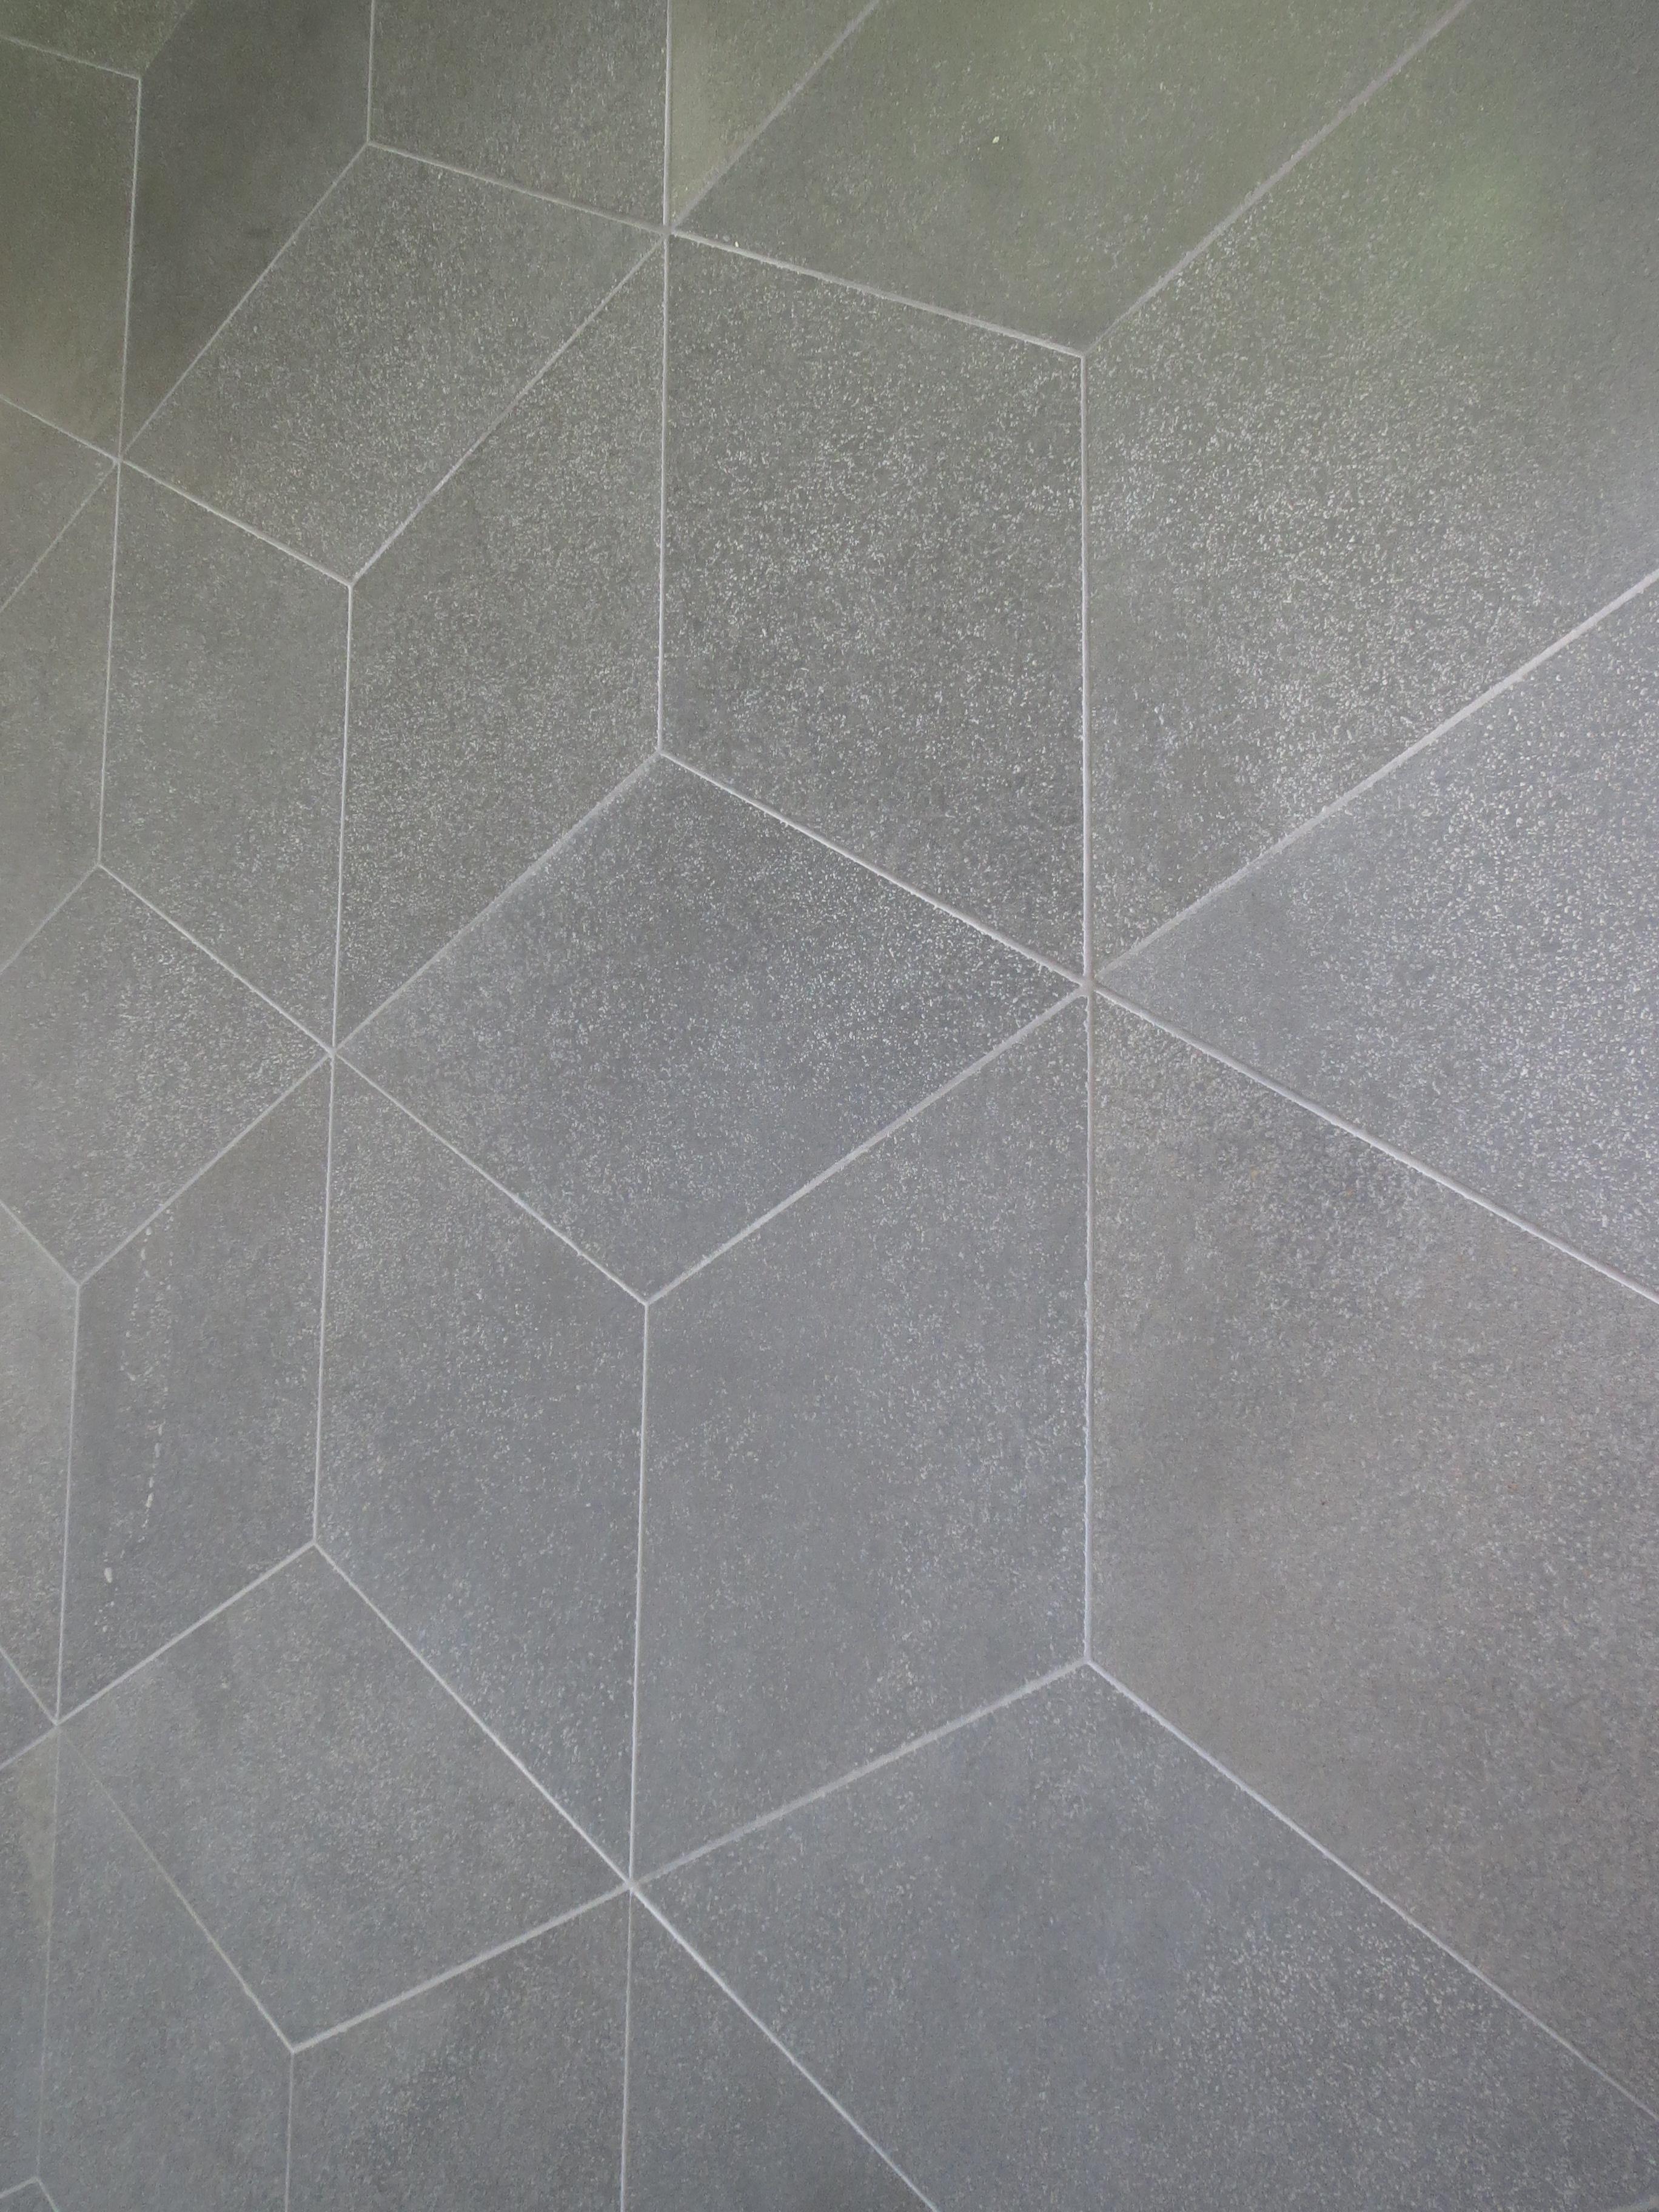 Bluestone tile flooring images tile flooring design ideas bluestone tile flooring image collections tile flooring design ideas myths about honed blue stone travertine ok dailygadgetfo Images